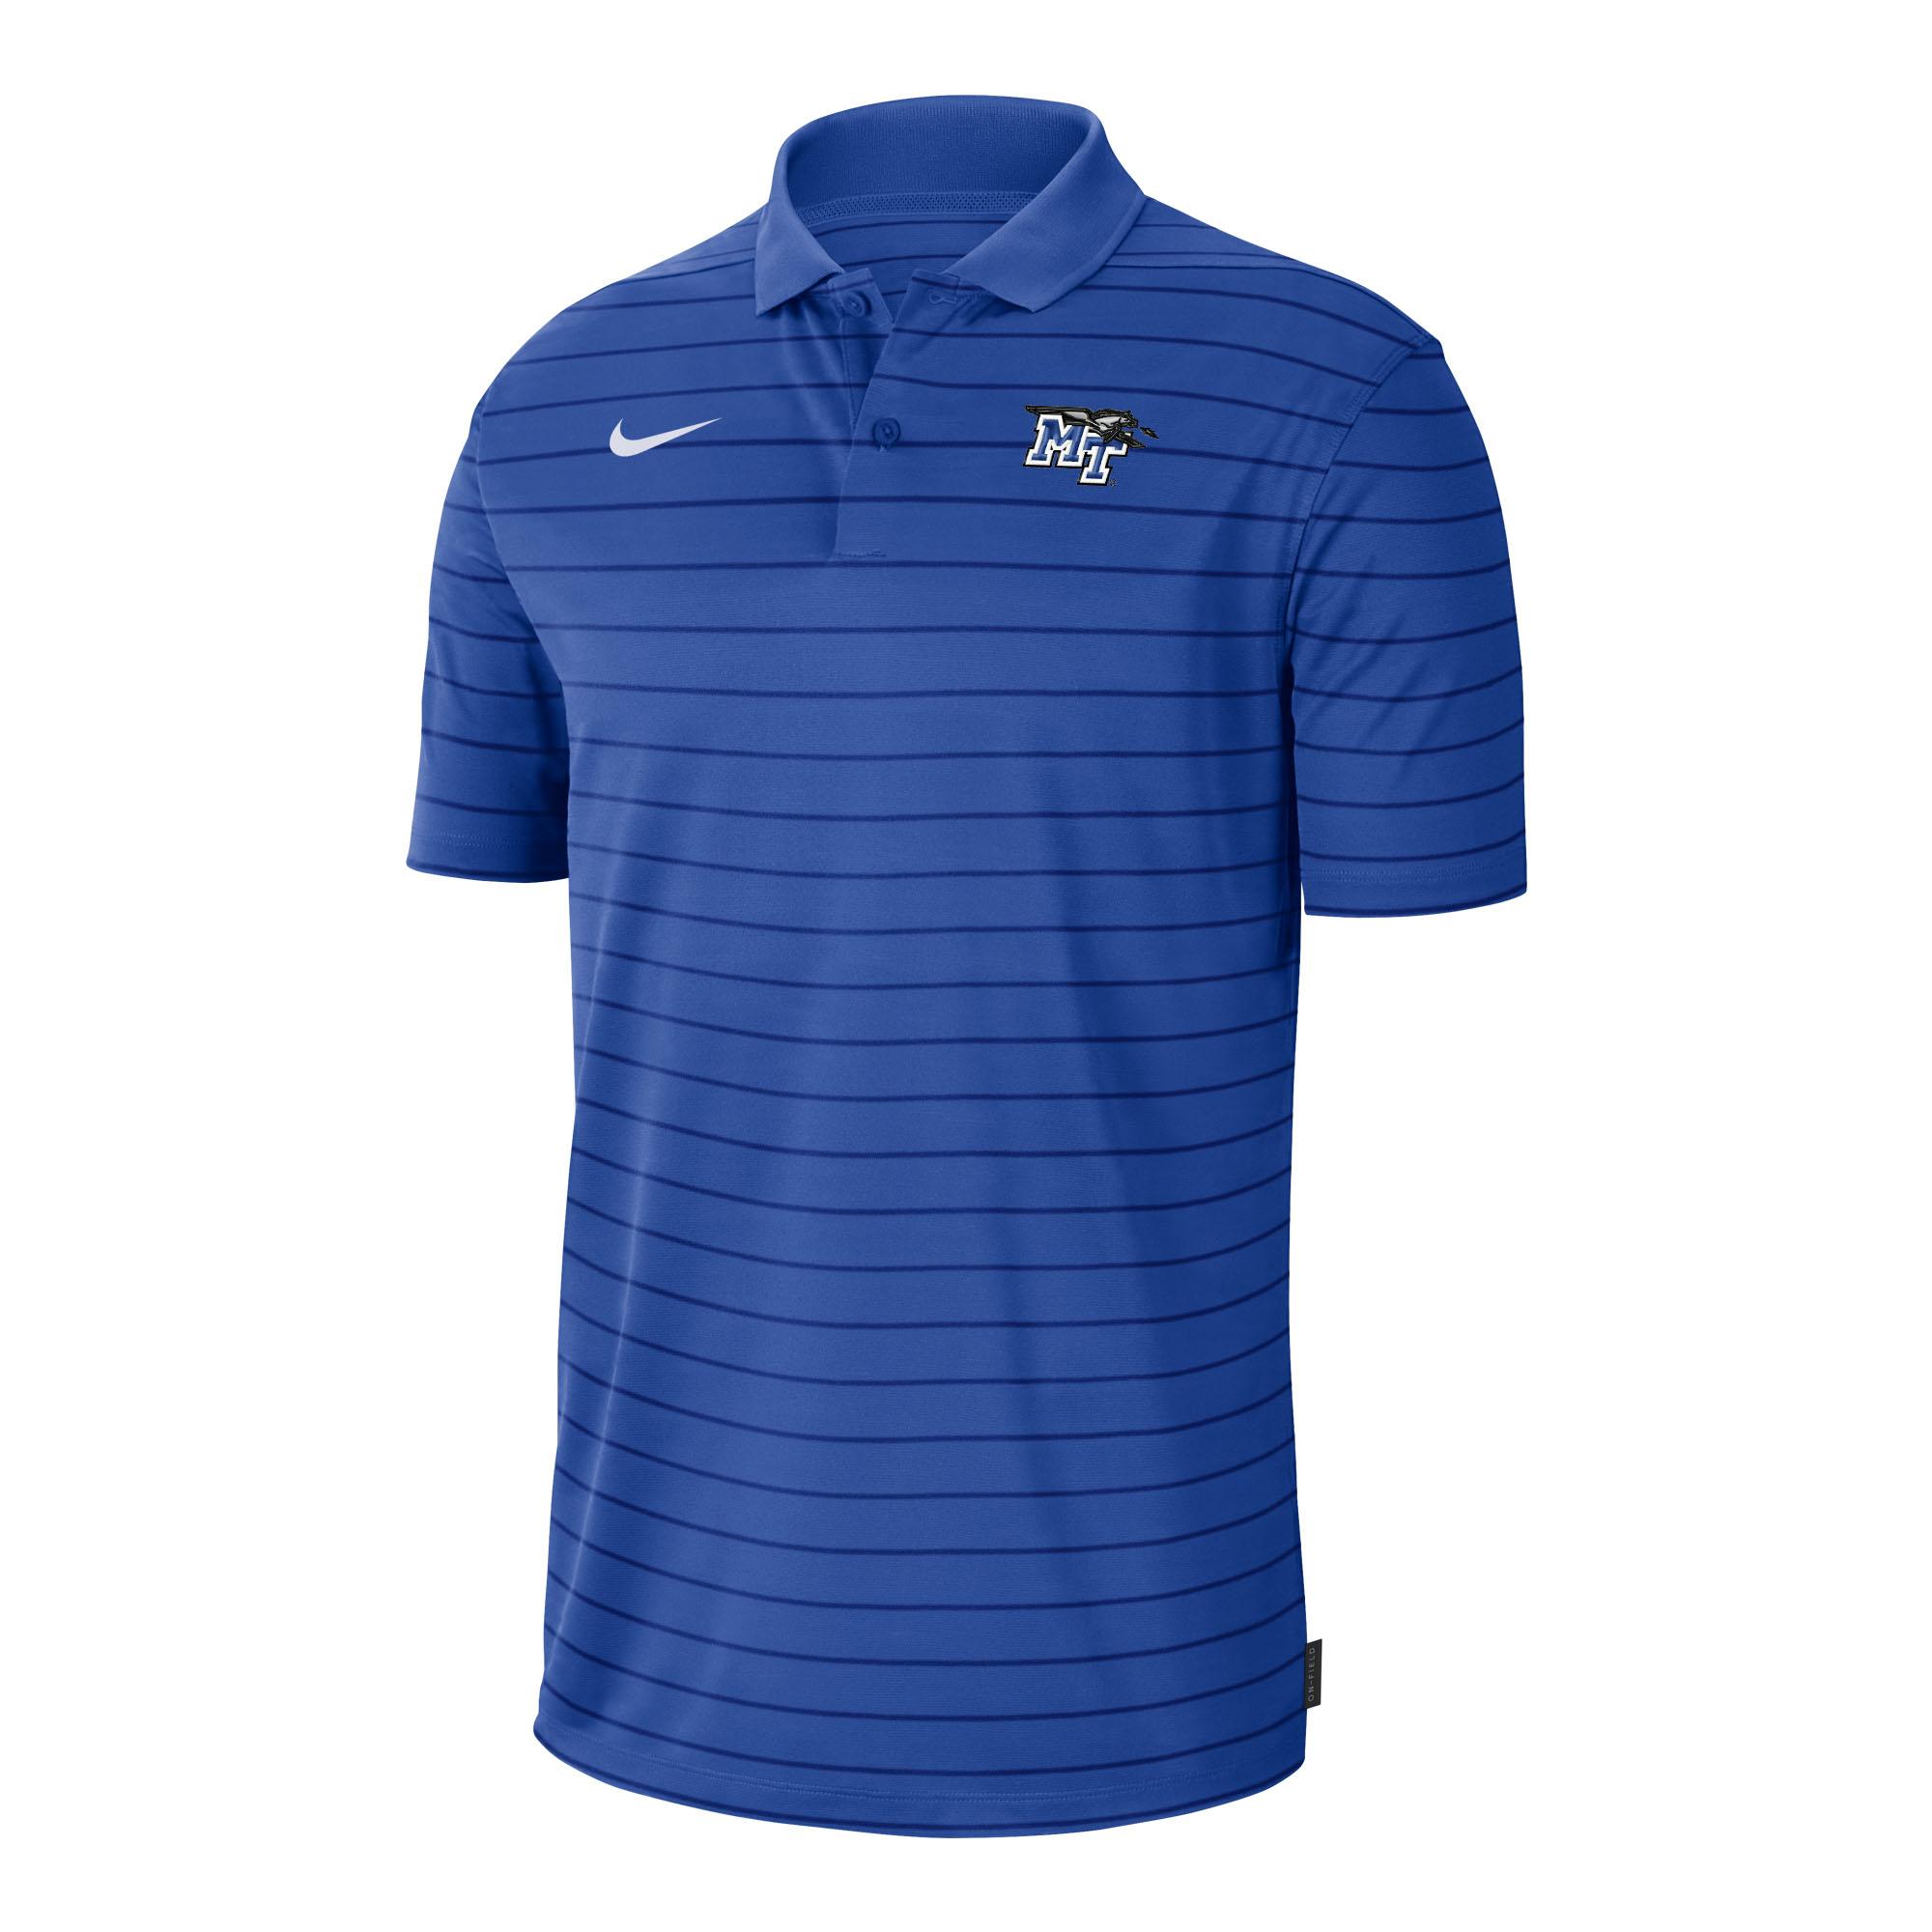 MT Logo w/ Lightning Victory Stripe Nike Sideline® Polo